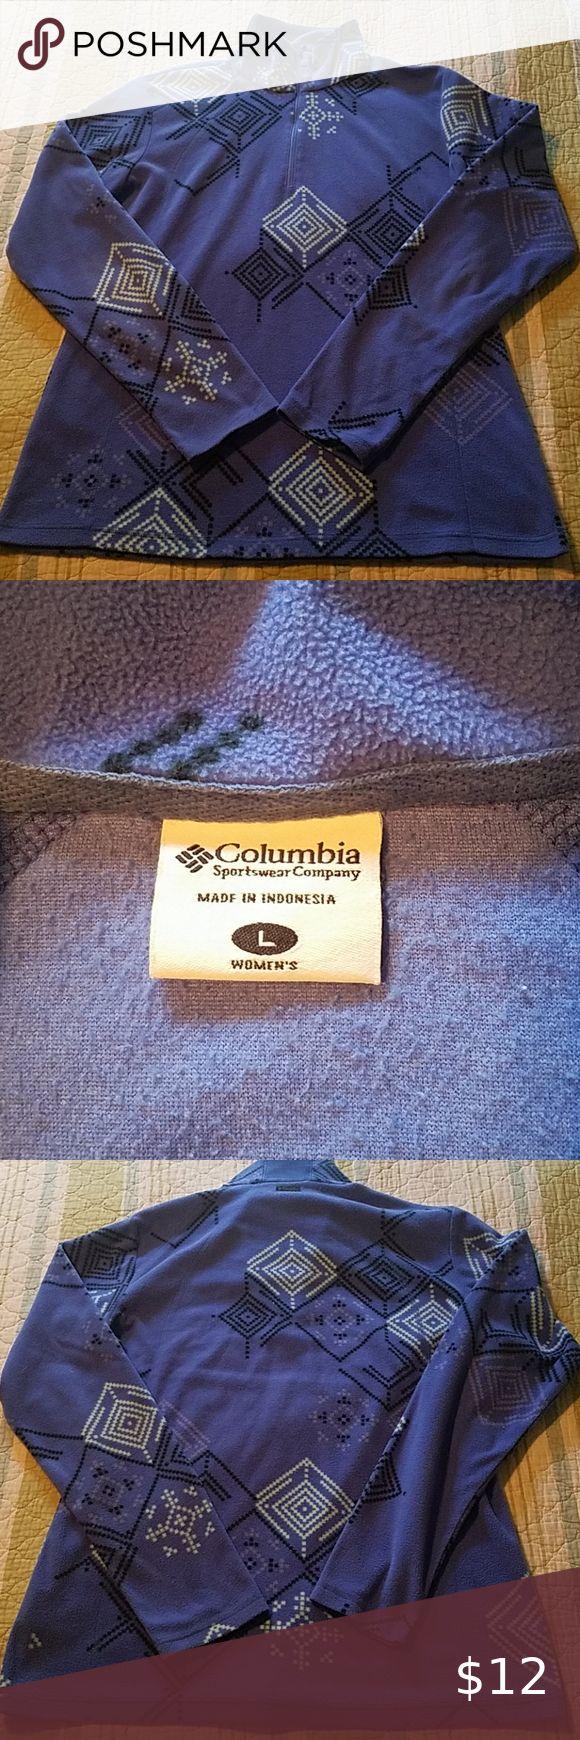 Columbia 1/4 zip size large in 2020 Zip, Columbia sports